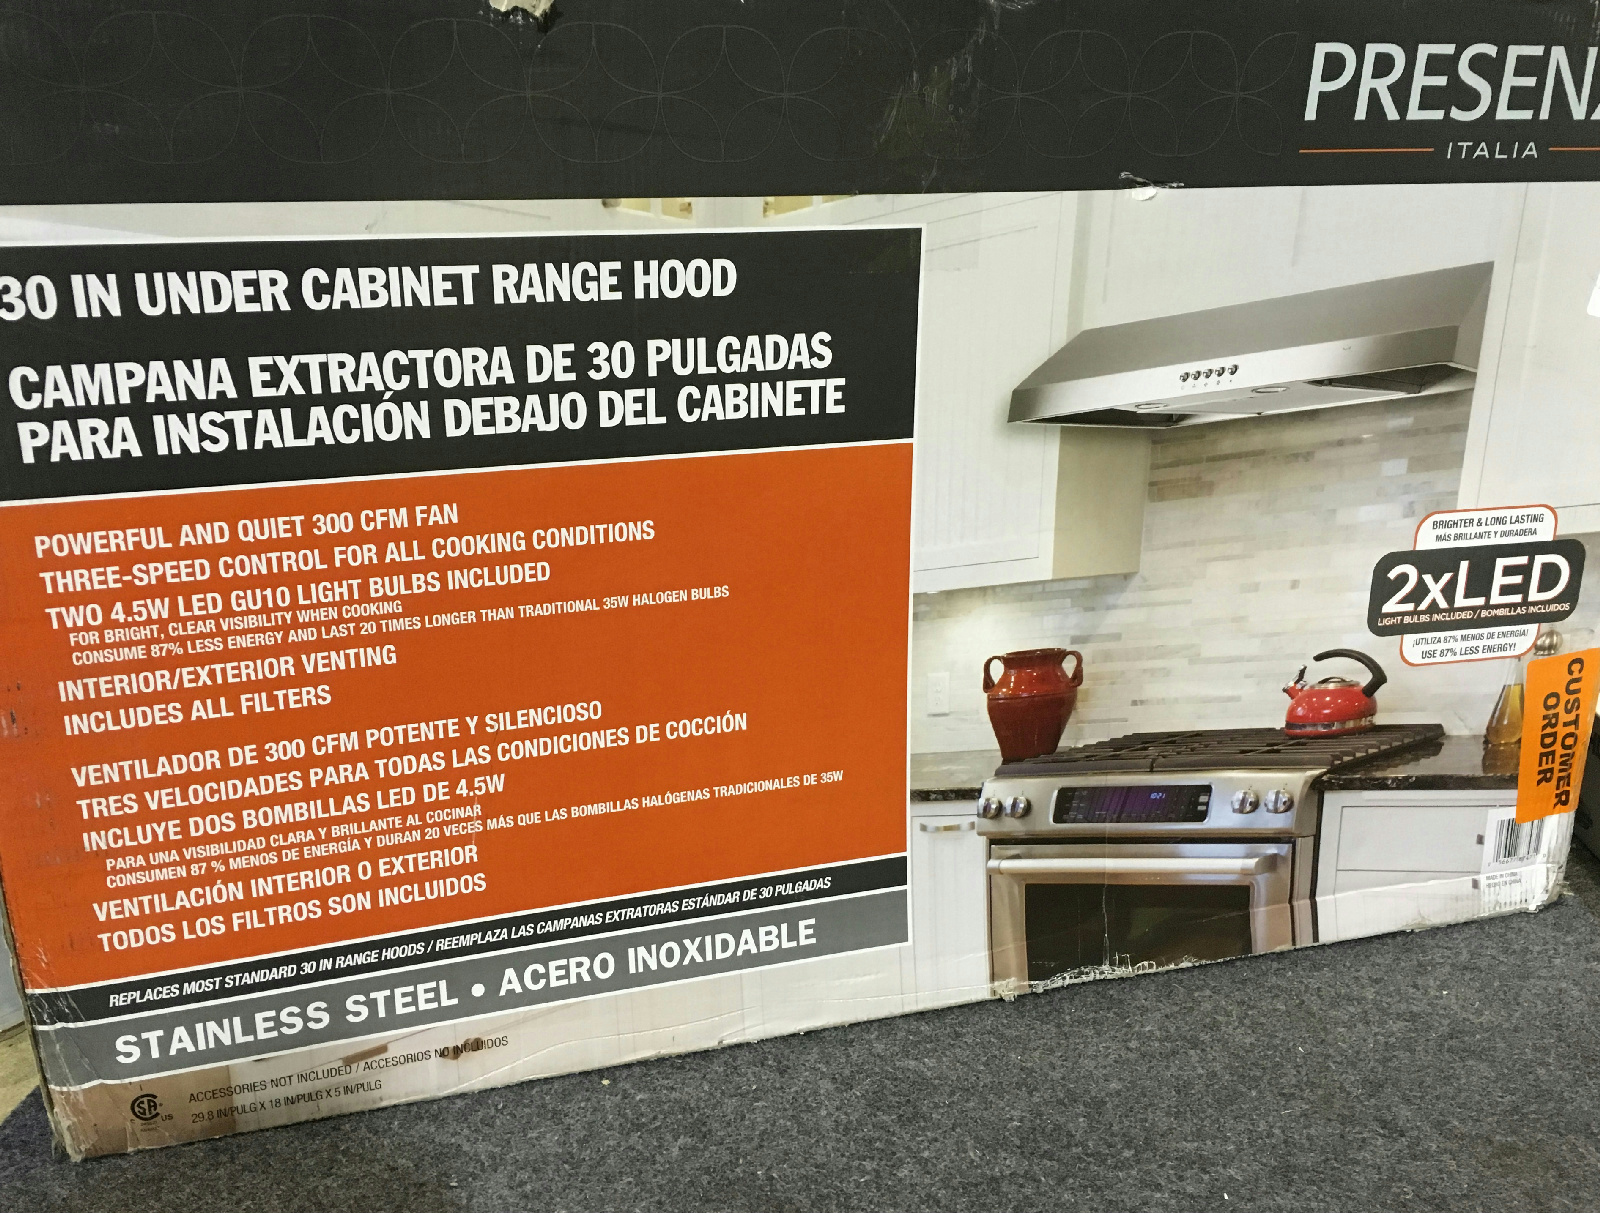 Most Powerful Range Hood ~ Presenza quot under cabinet range hood in stainless steel w